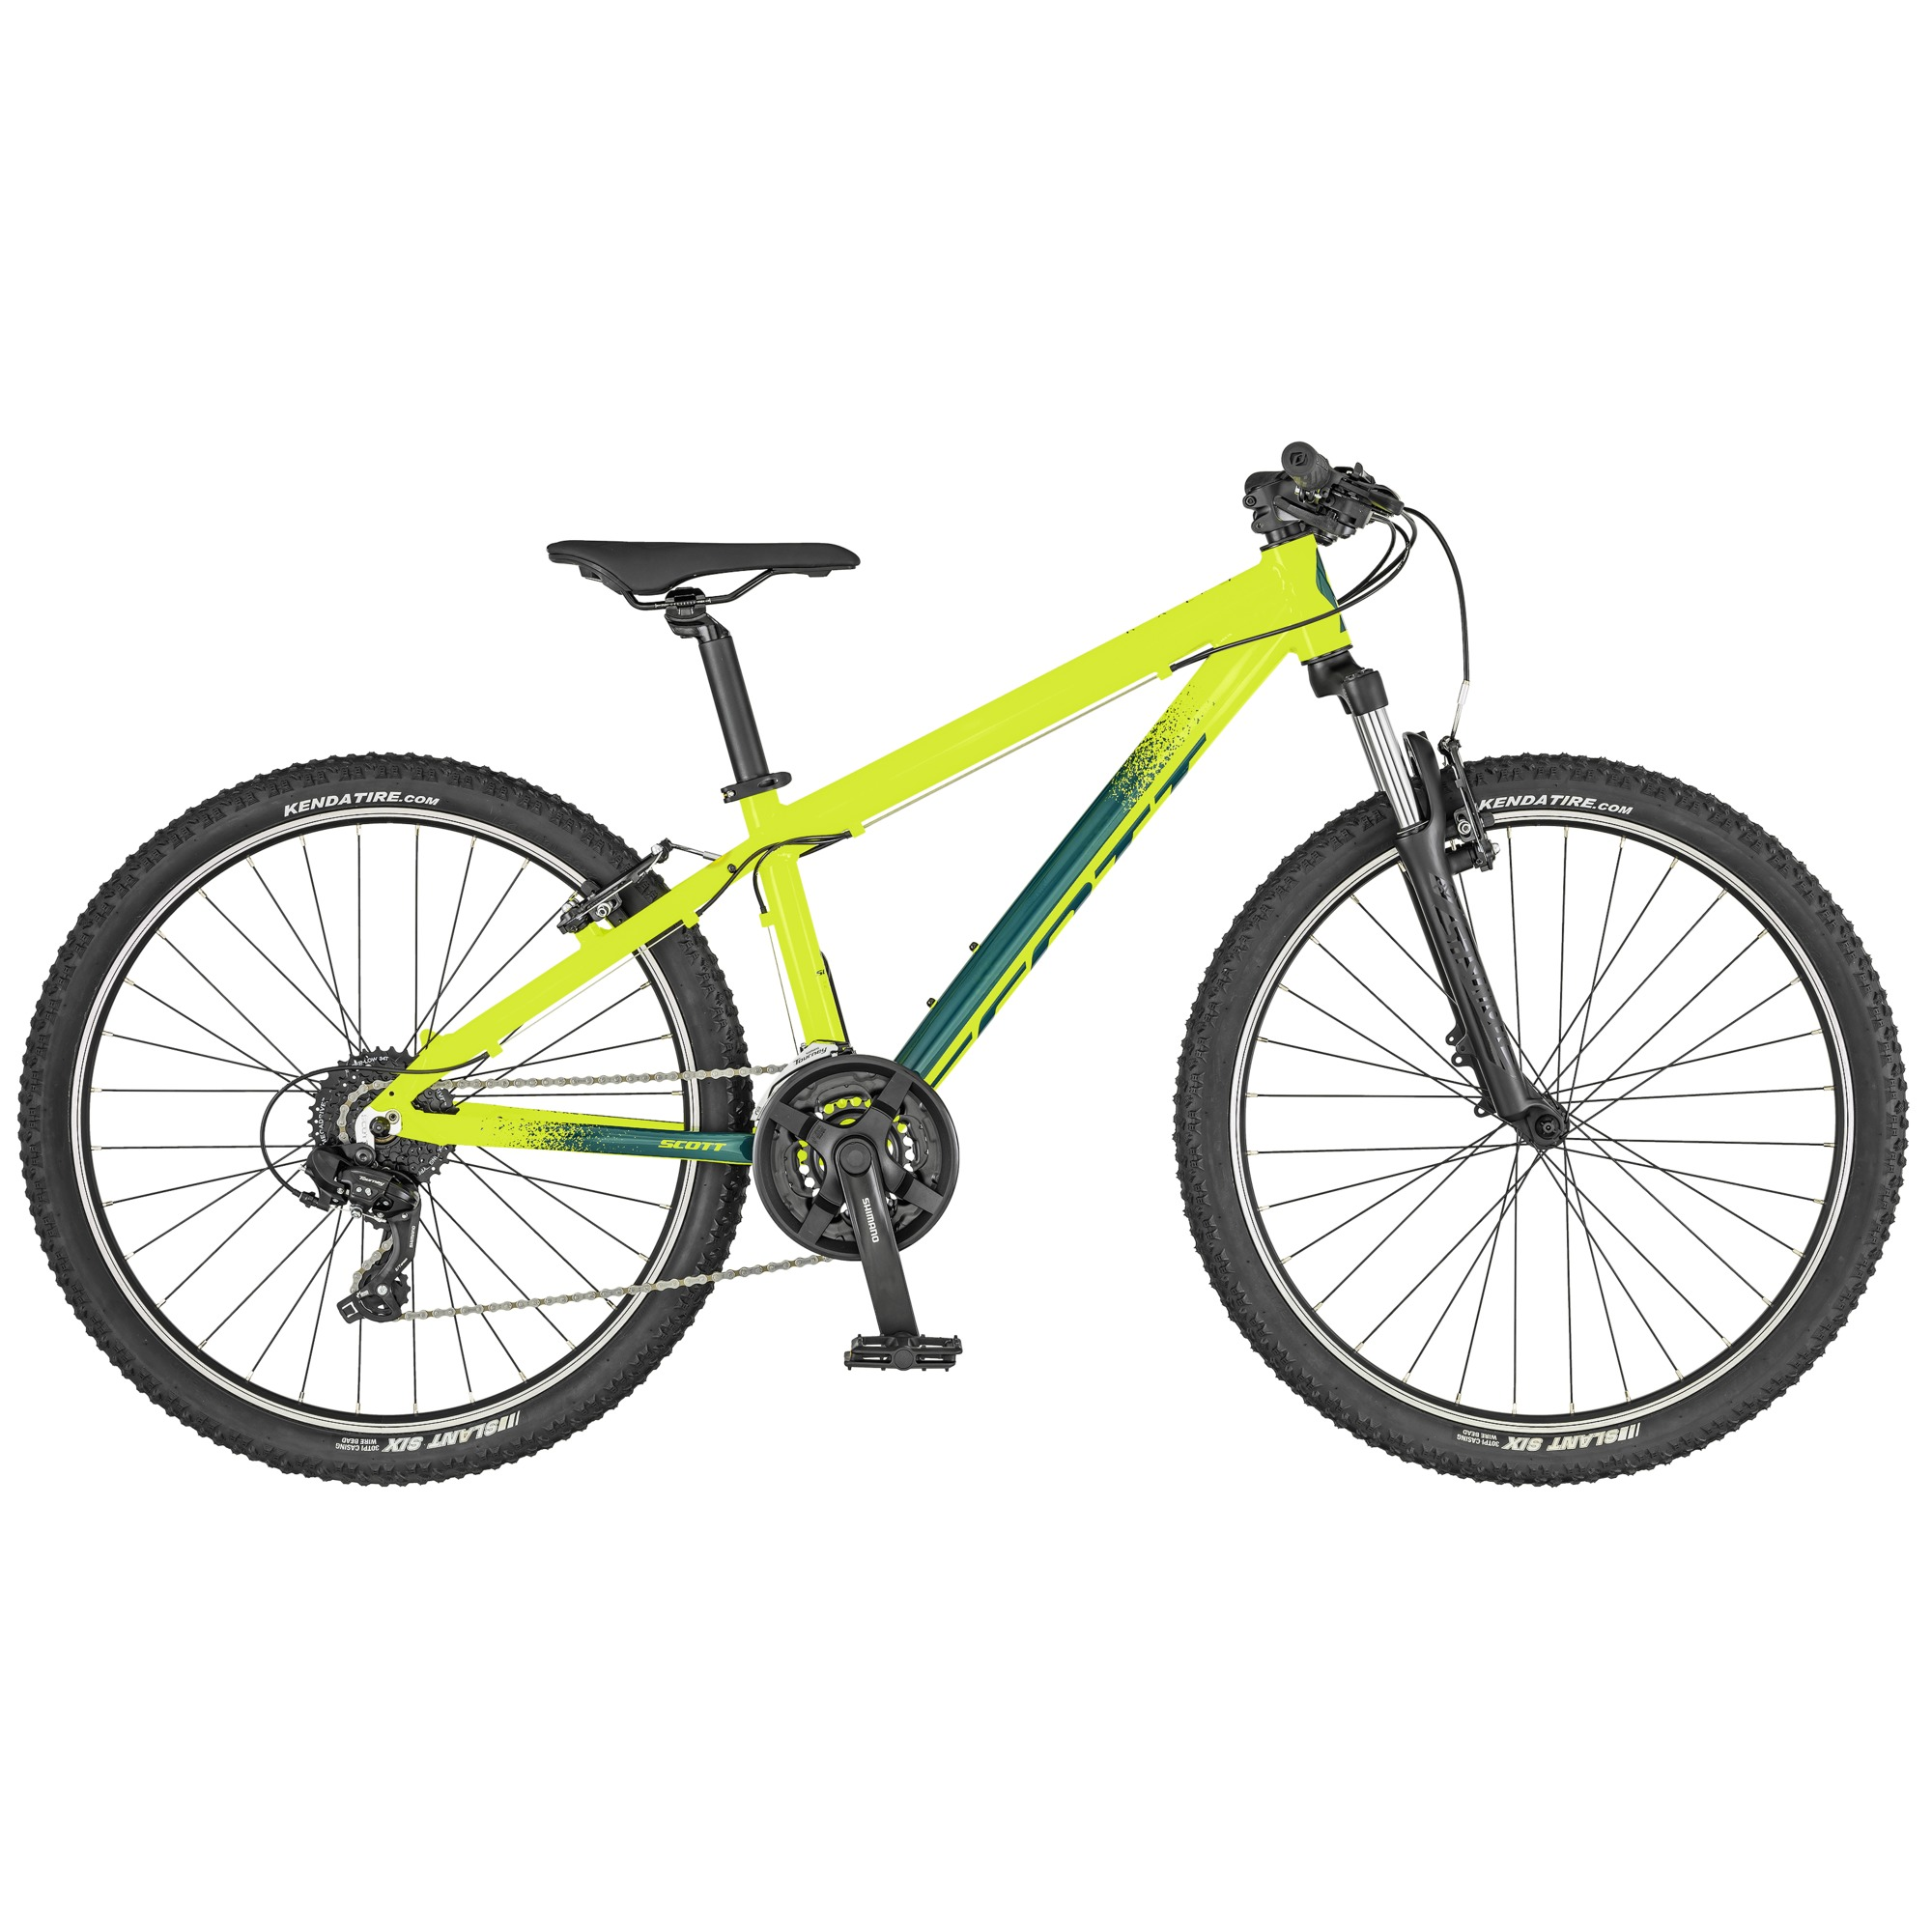 SCOTT Roxter 620 Bike S - Fahrrad online kaufen | Online Shop Bike Profis